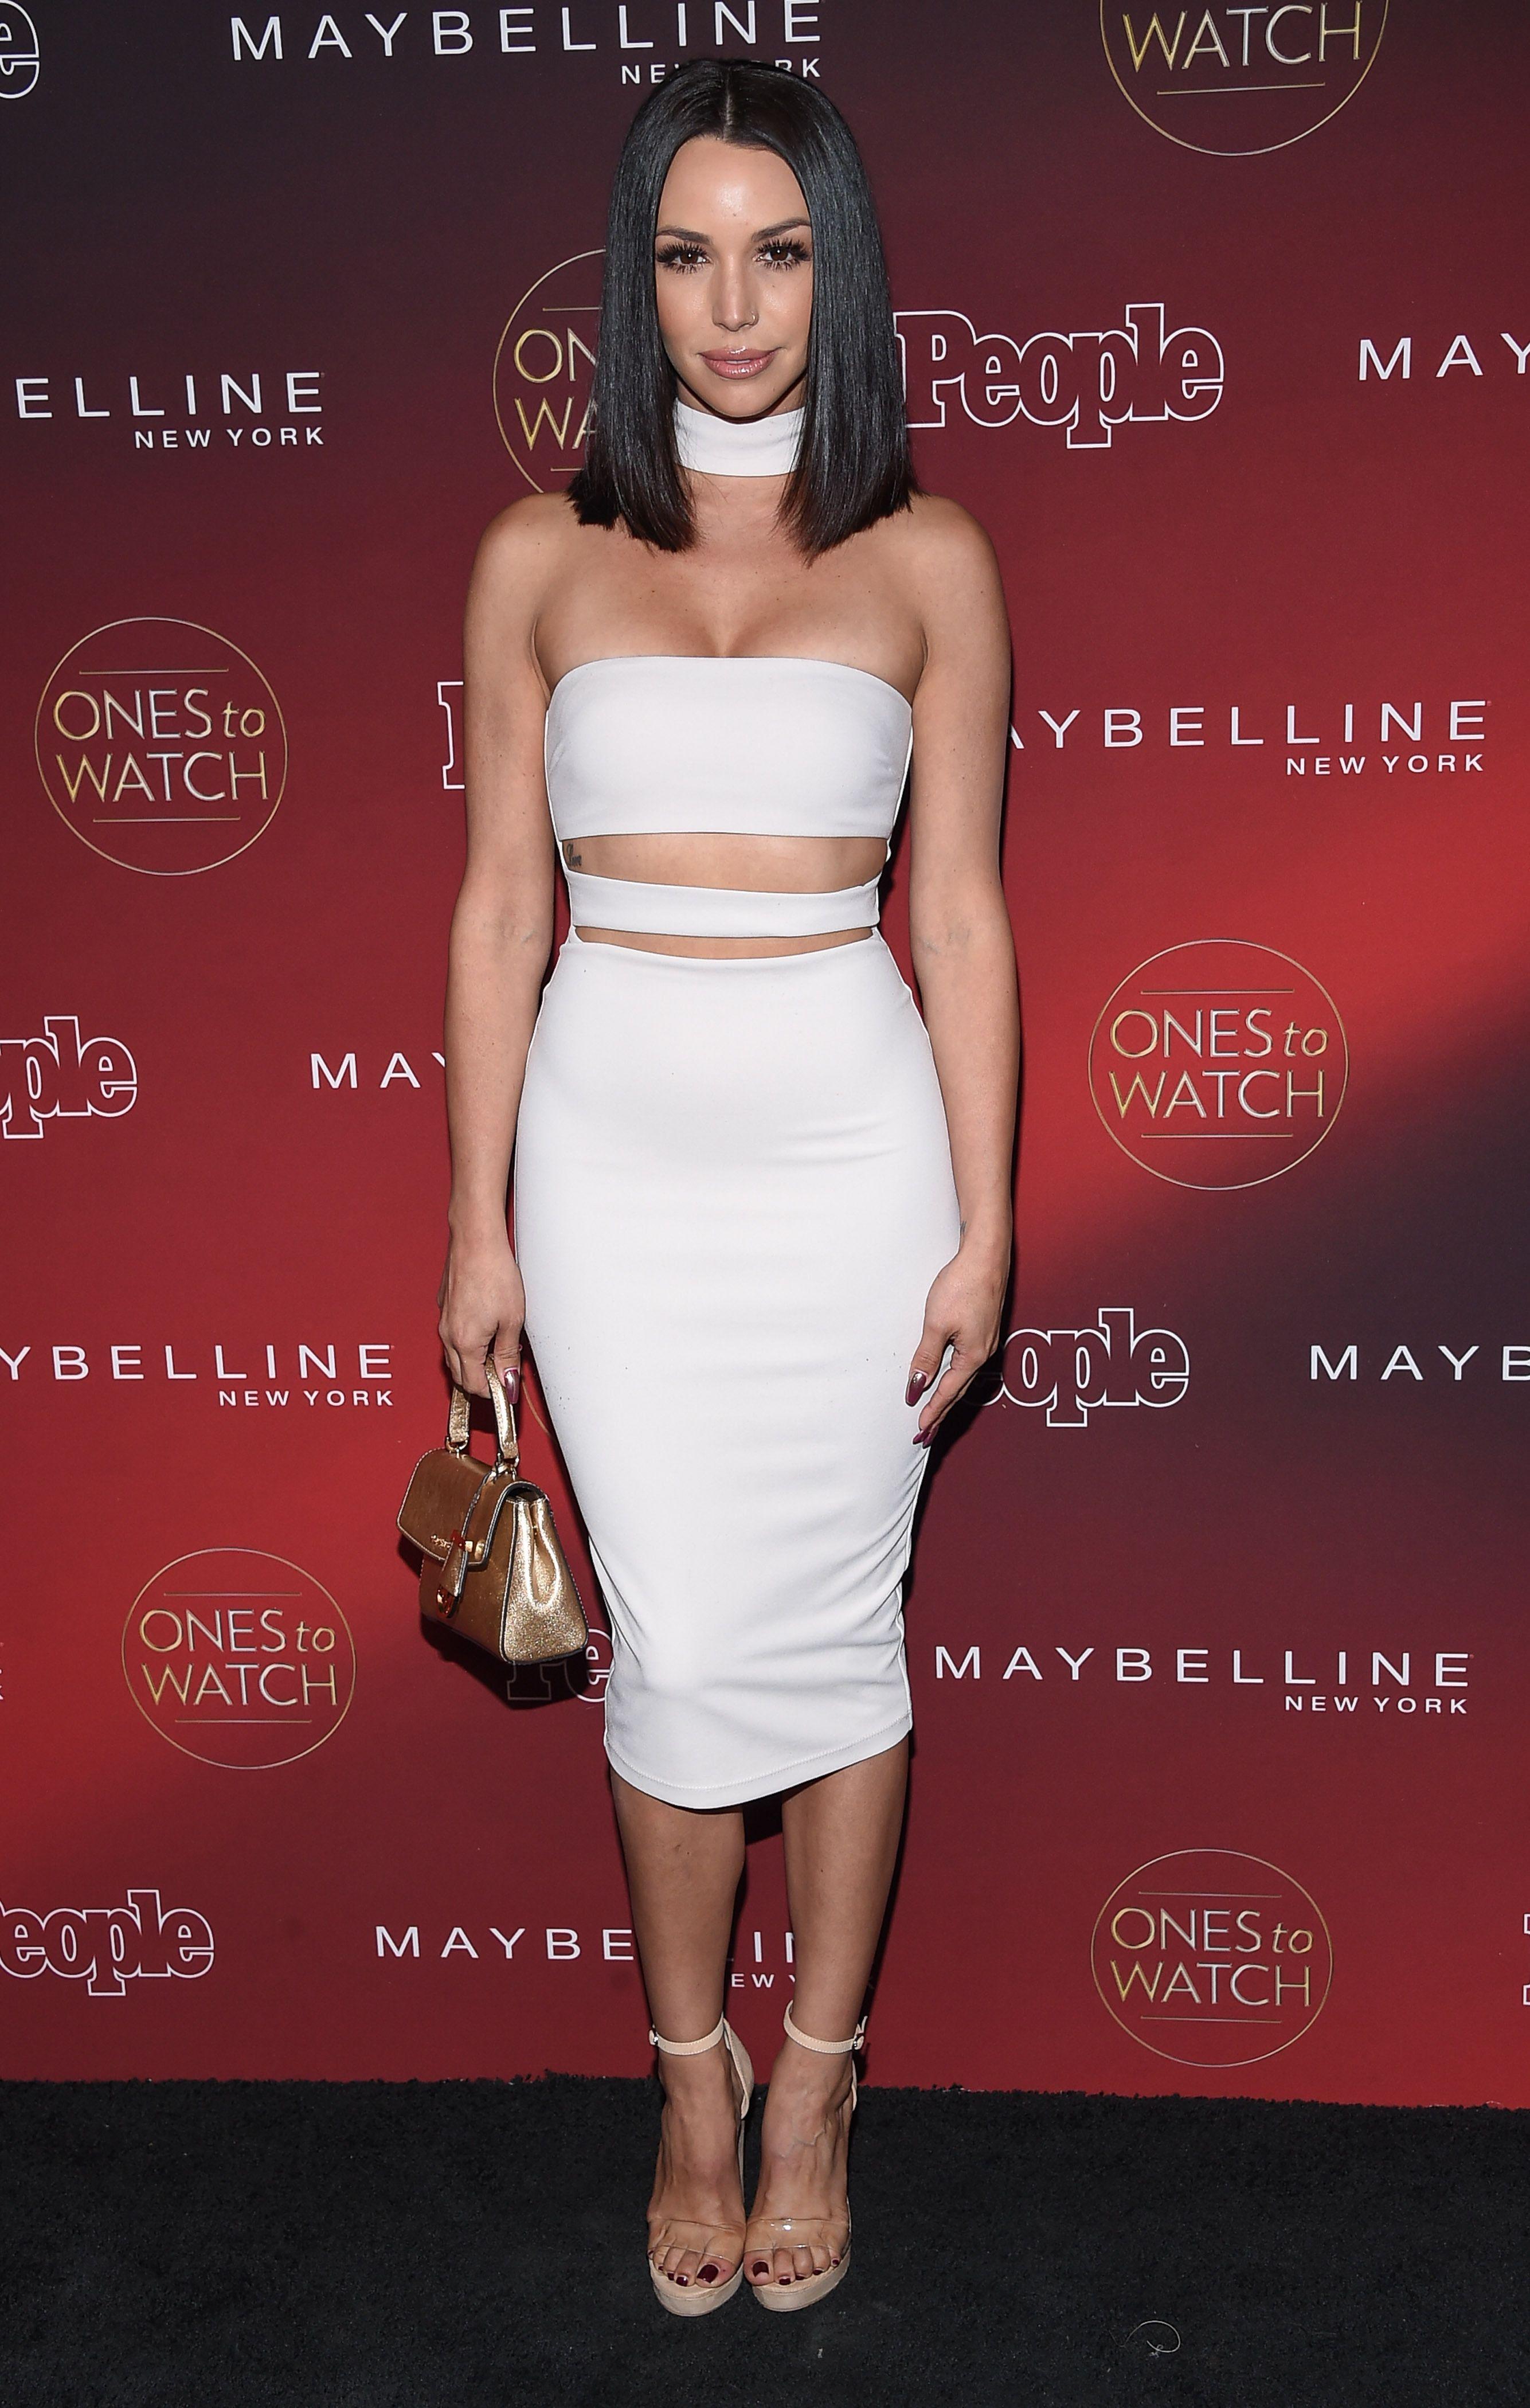 Scheana Shay wears a white crop top set and choker.